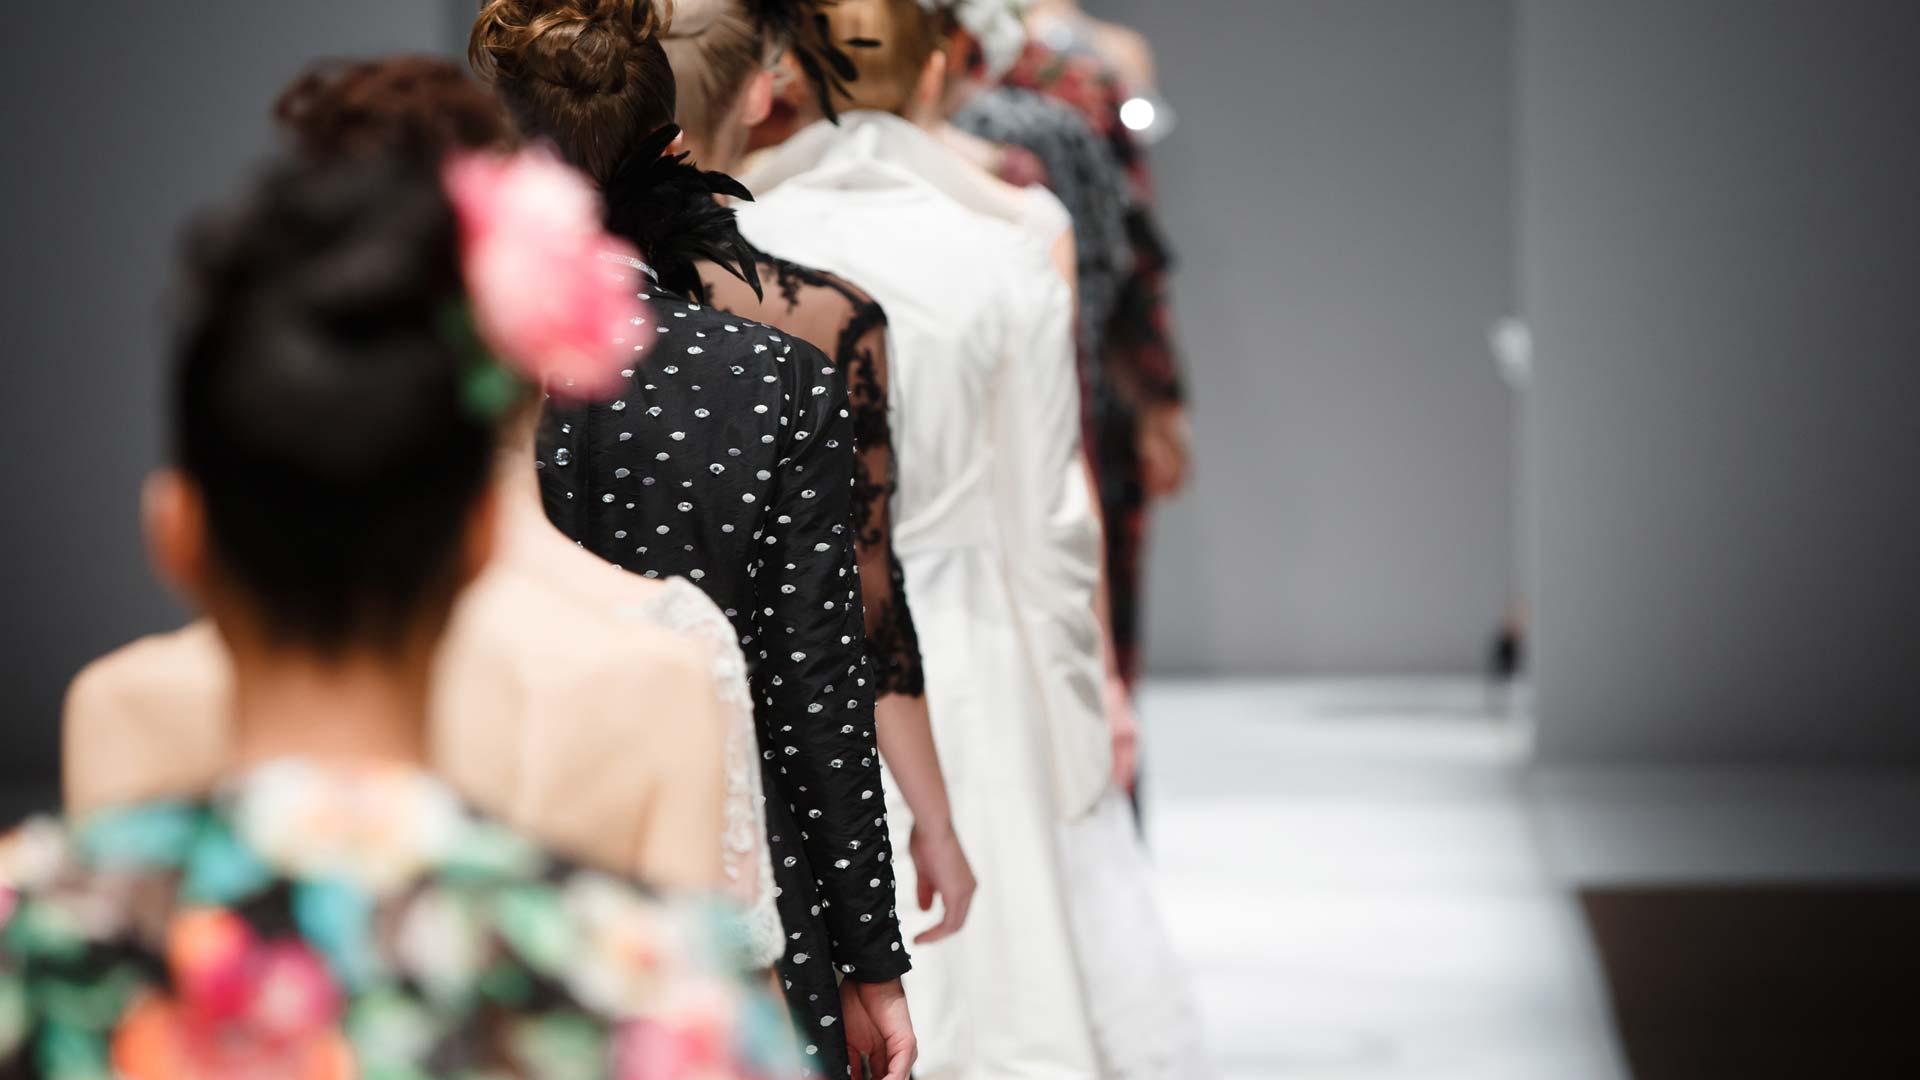 Fashion Design Majot By Tanmos5656 On Emaze